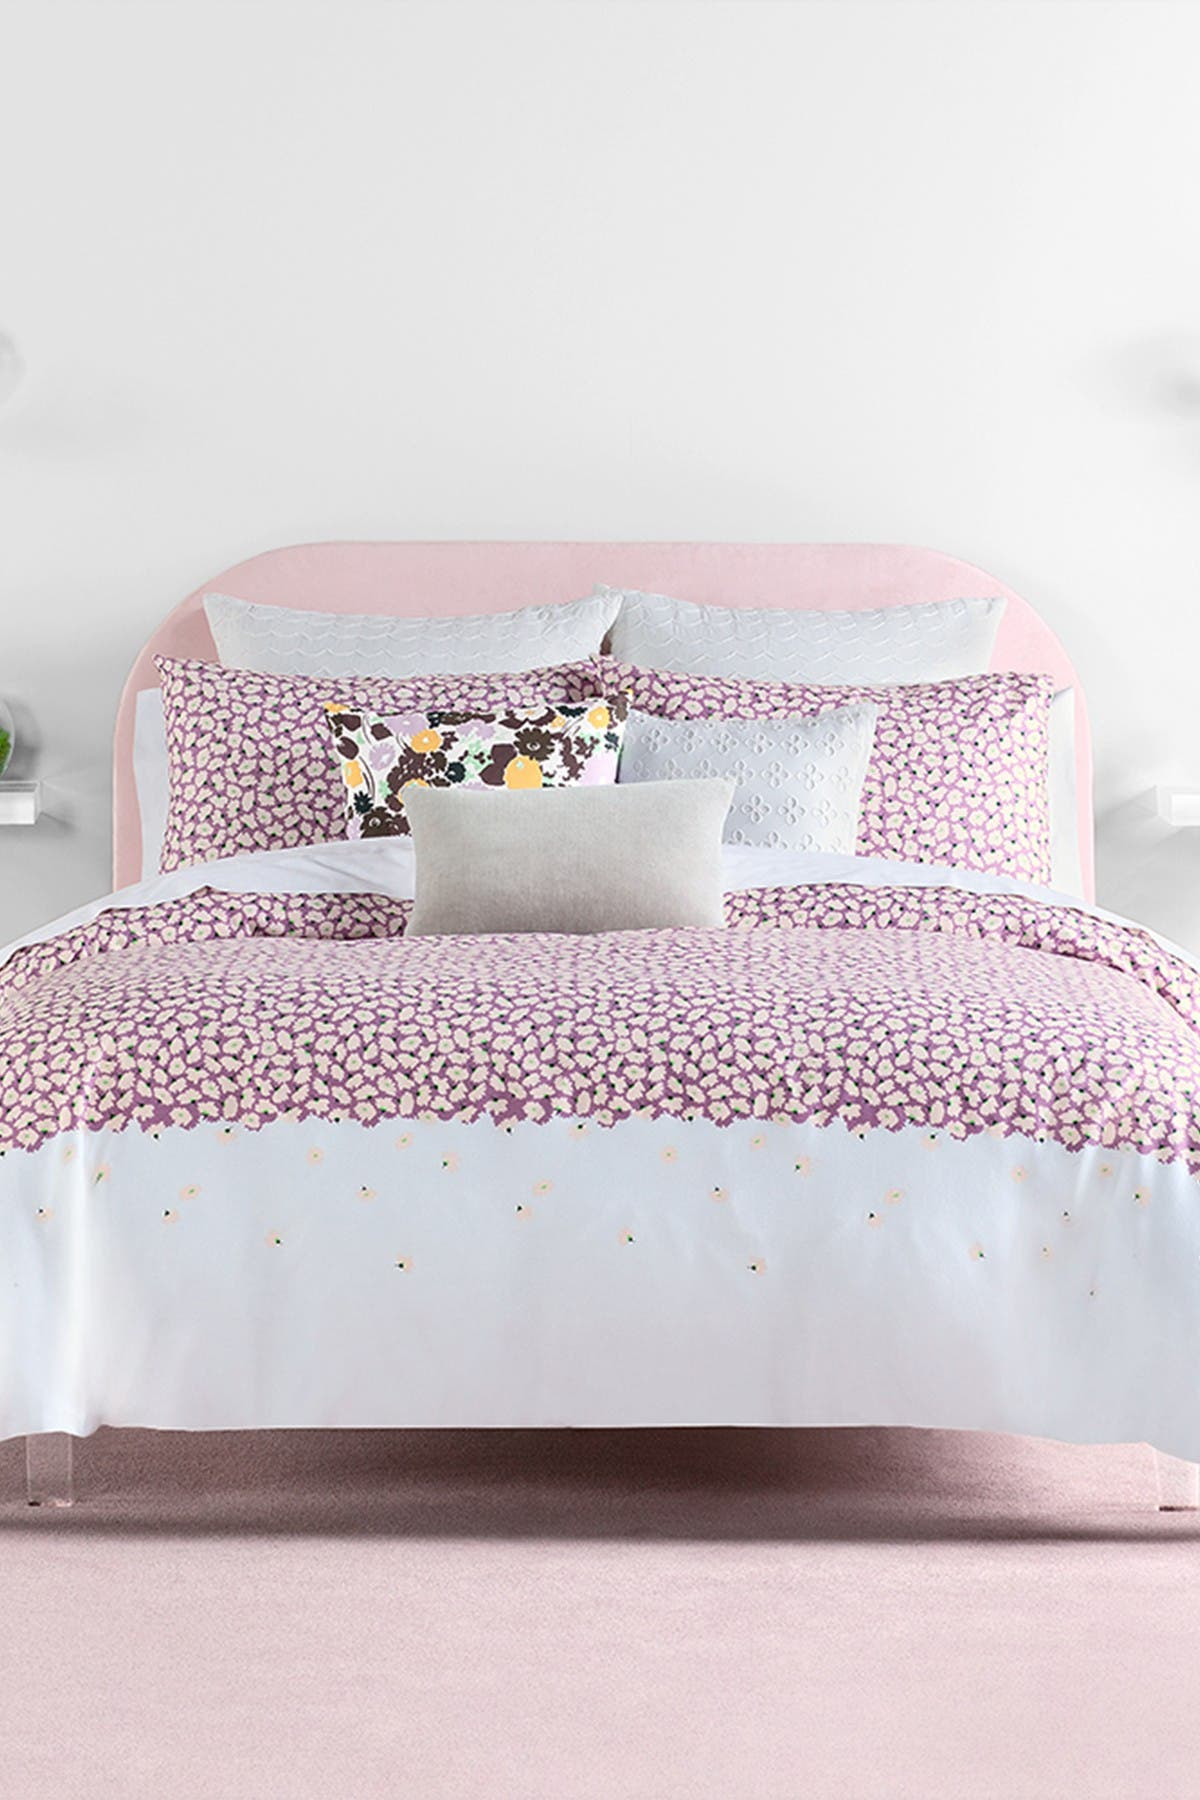 Image of kate spade new york lavender carnation full/queen comforter set